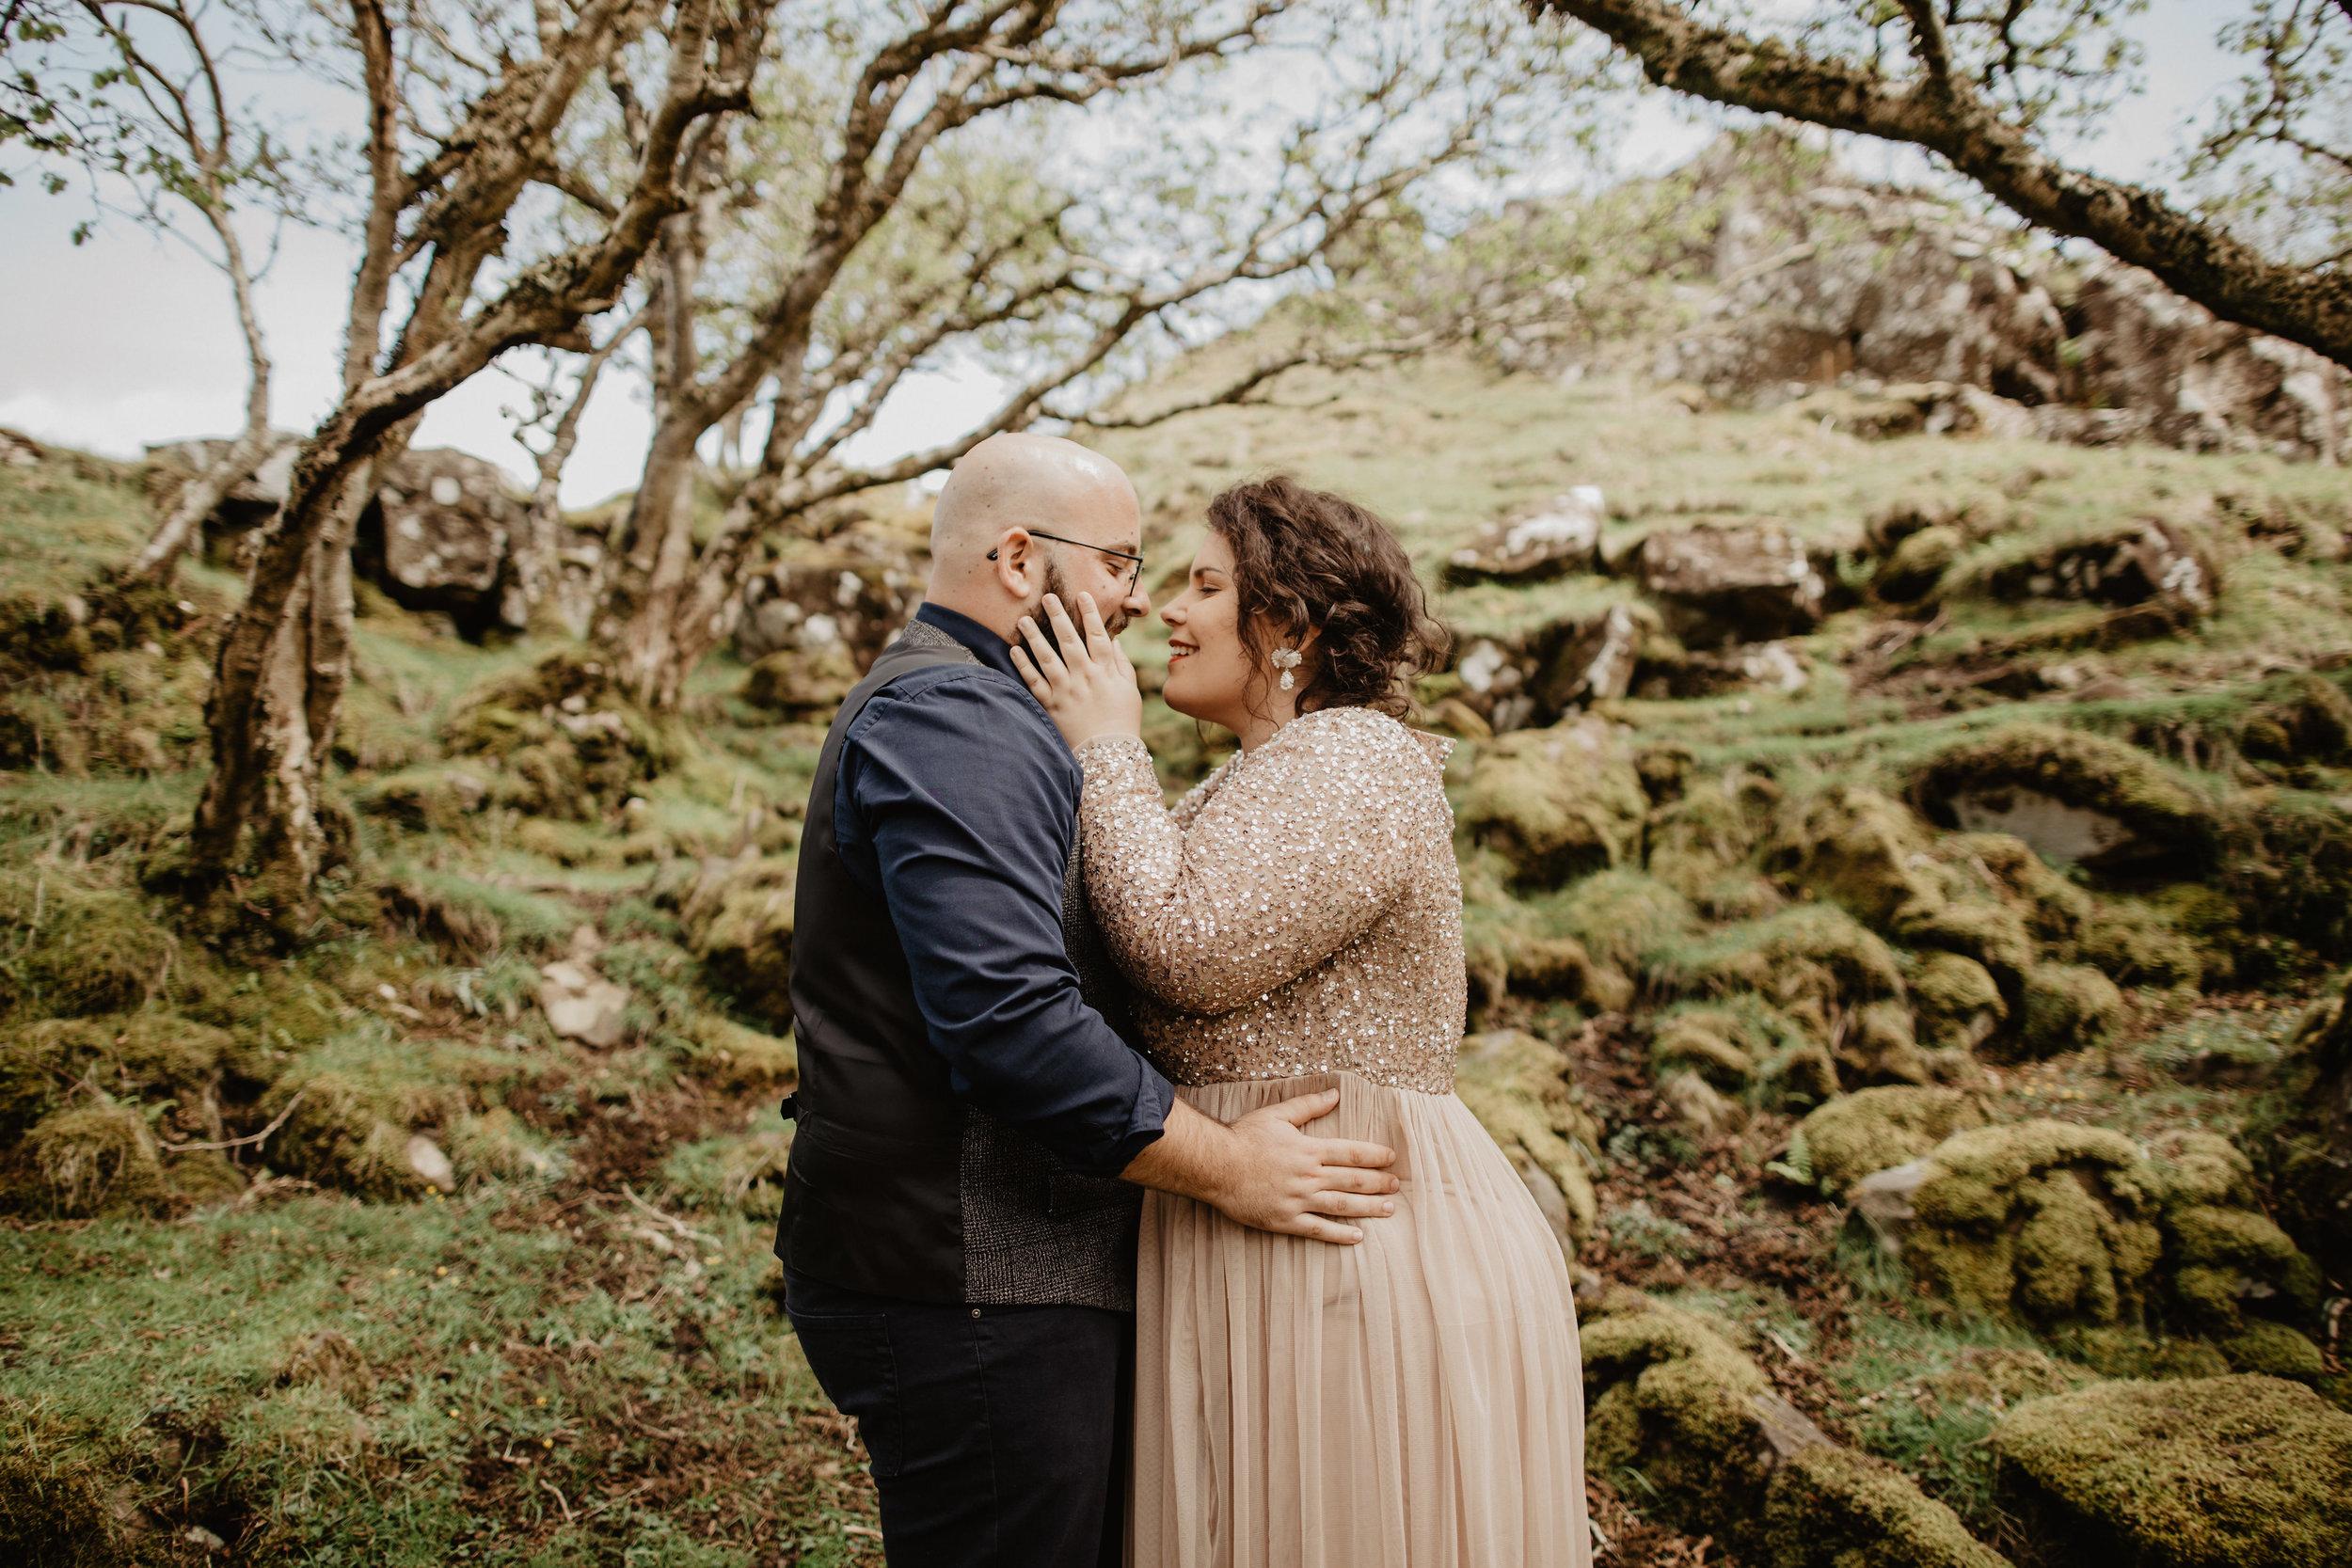 Lapela-photography-Isle-of-Skye-elopement-BTS-111.jpg